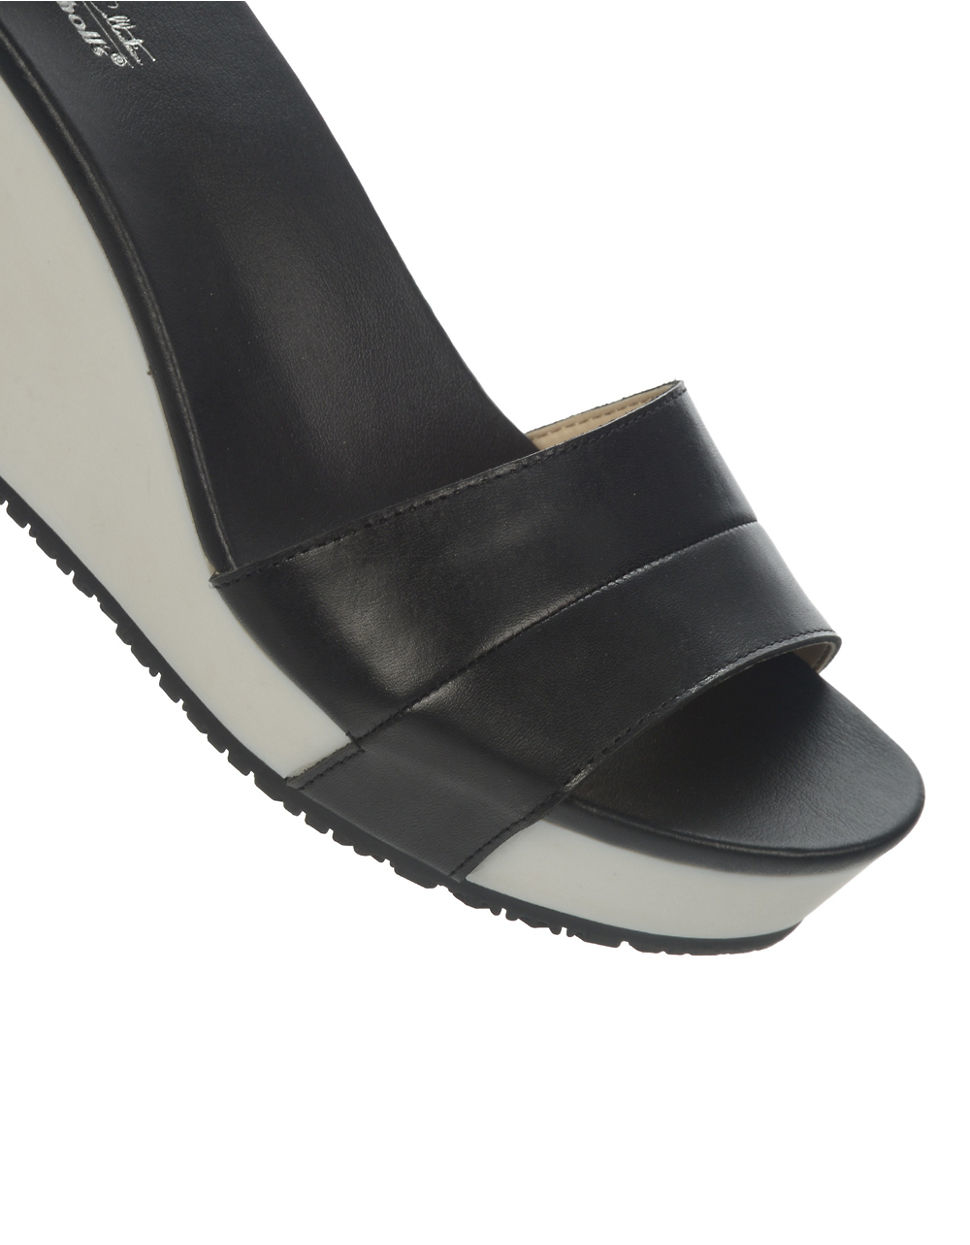 Dr Scholls Warner Wedge Sandals In Black Lyst